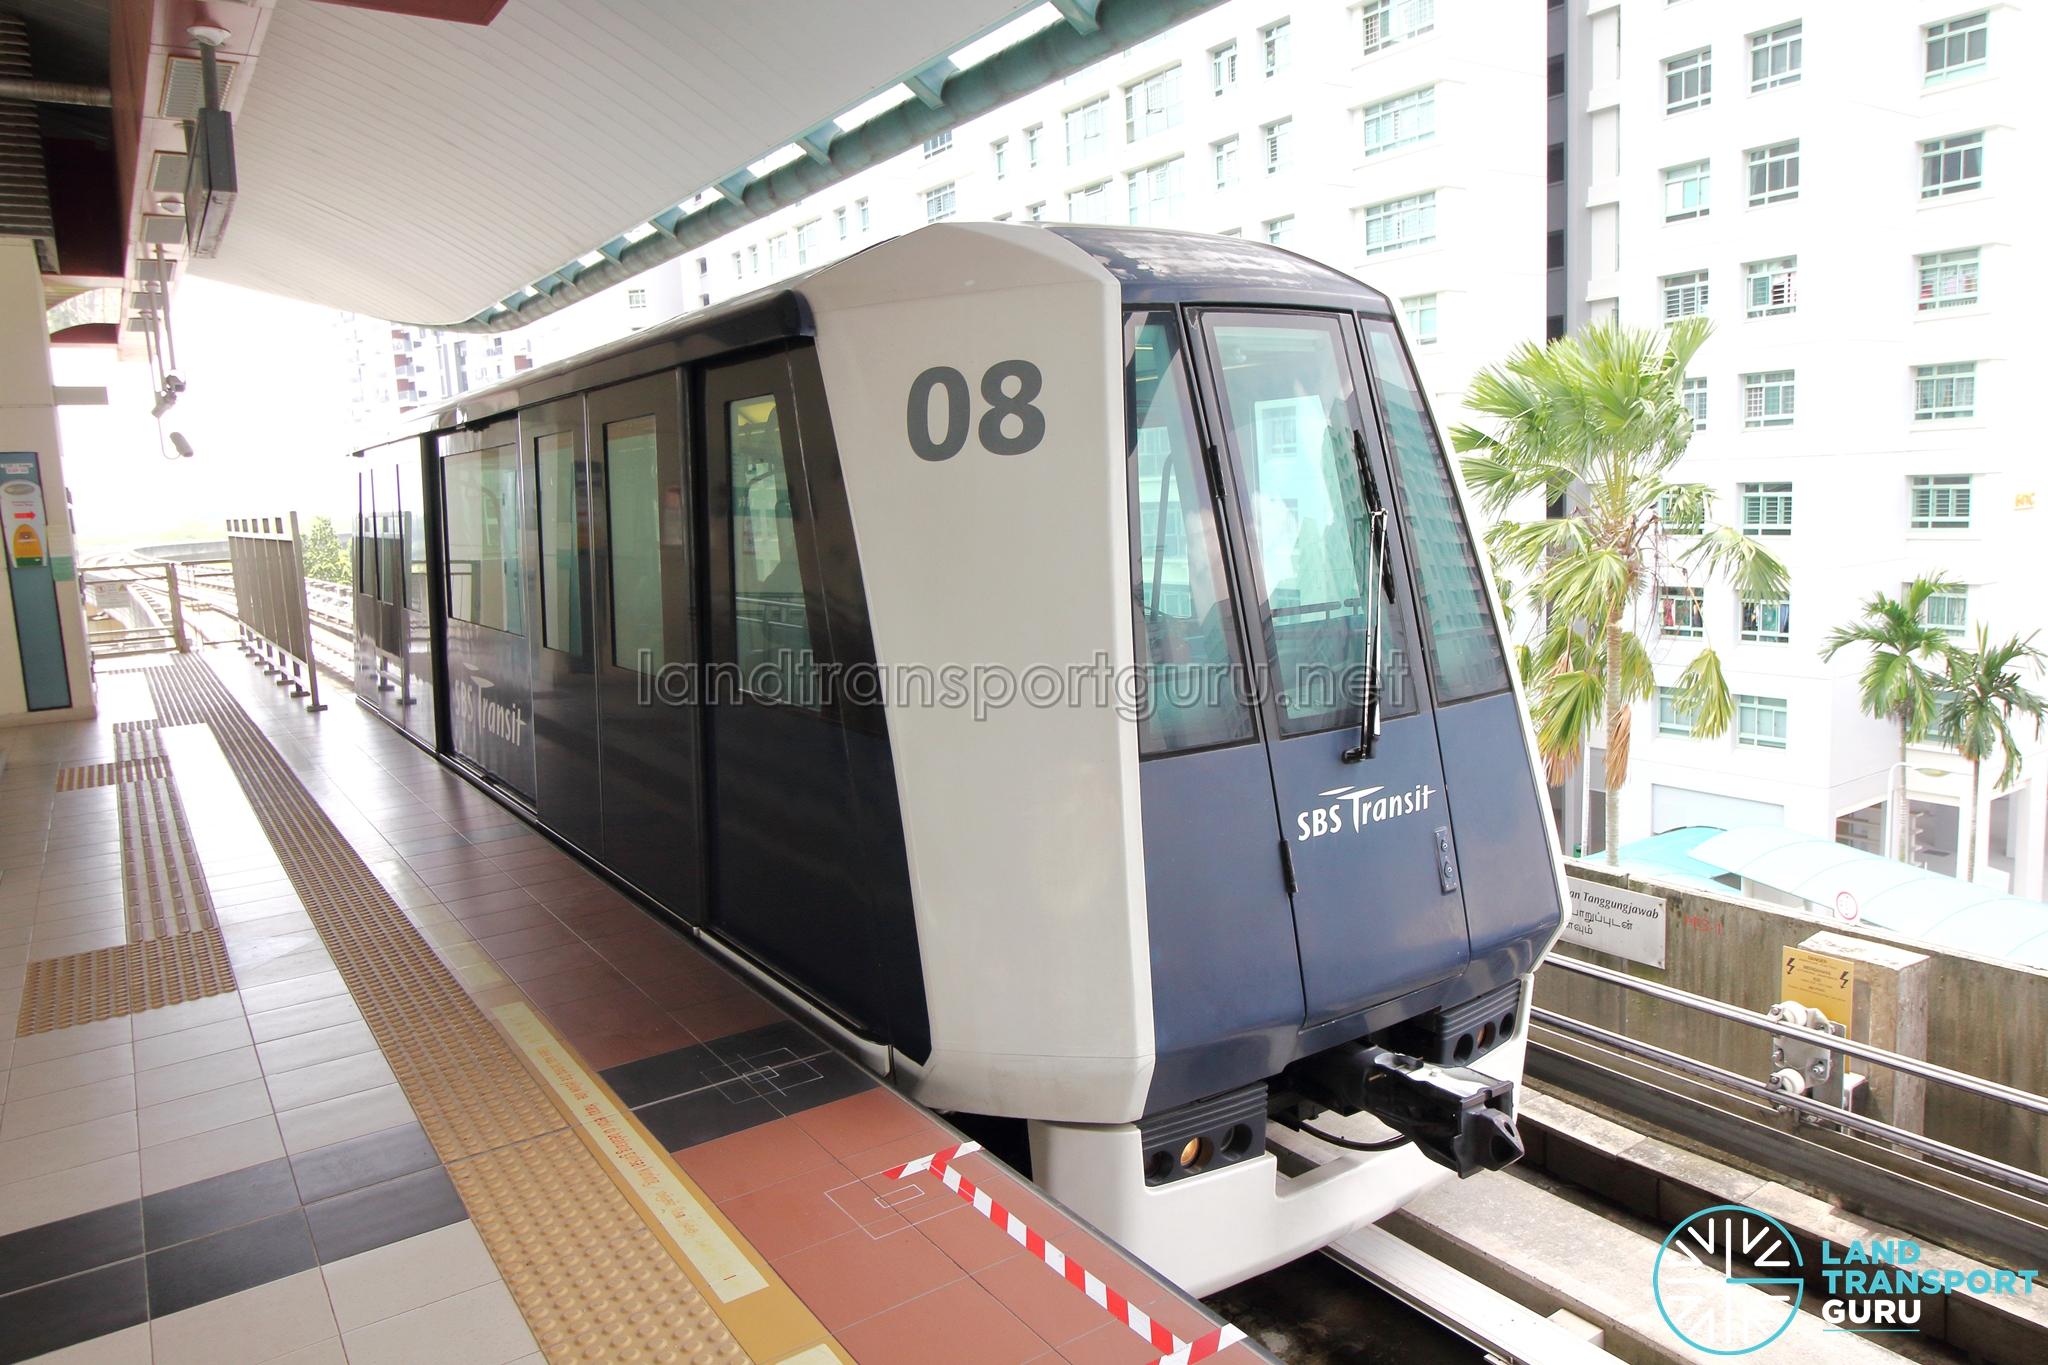 SBS Transit C810 Train in Single-car formation